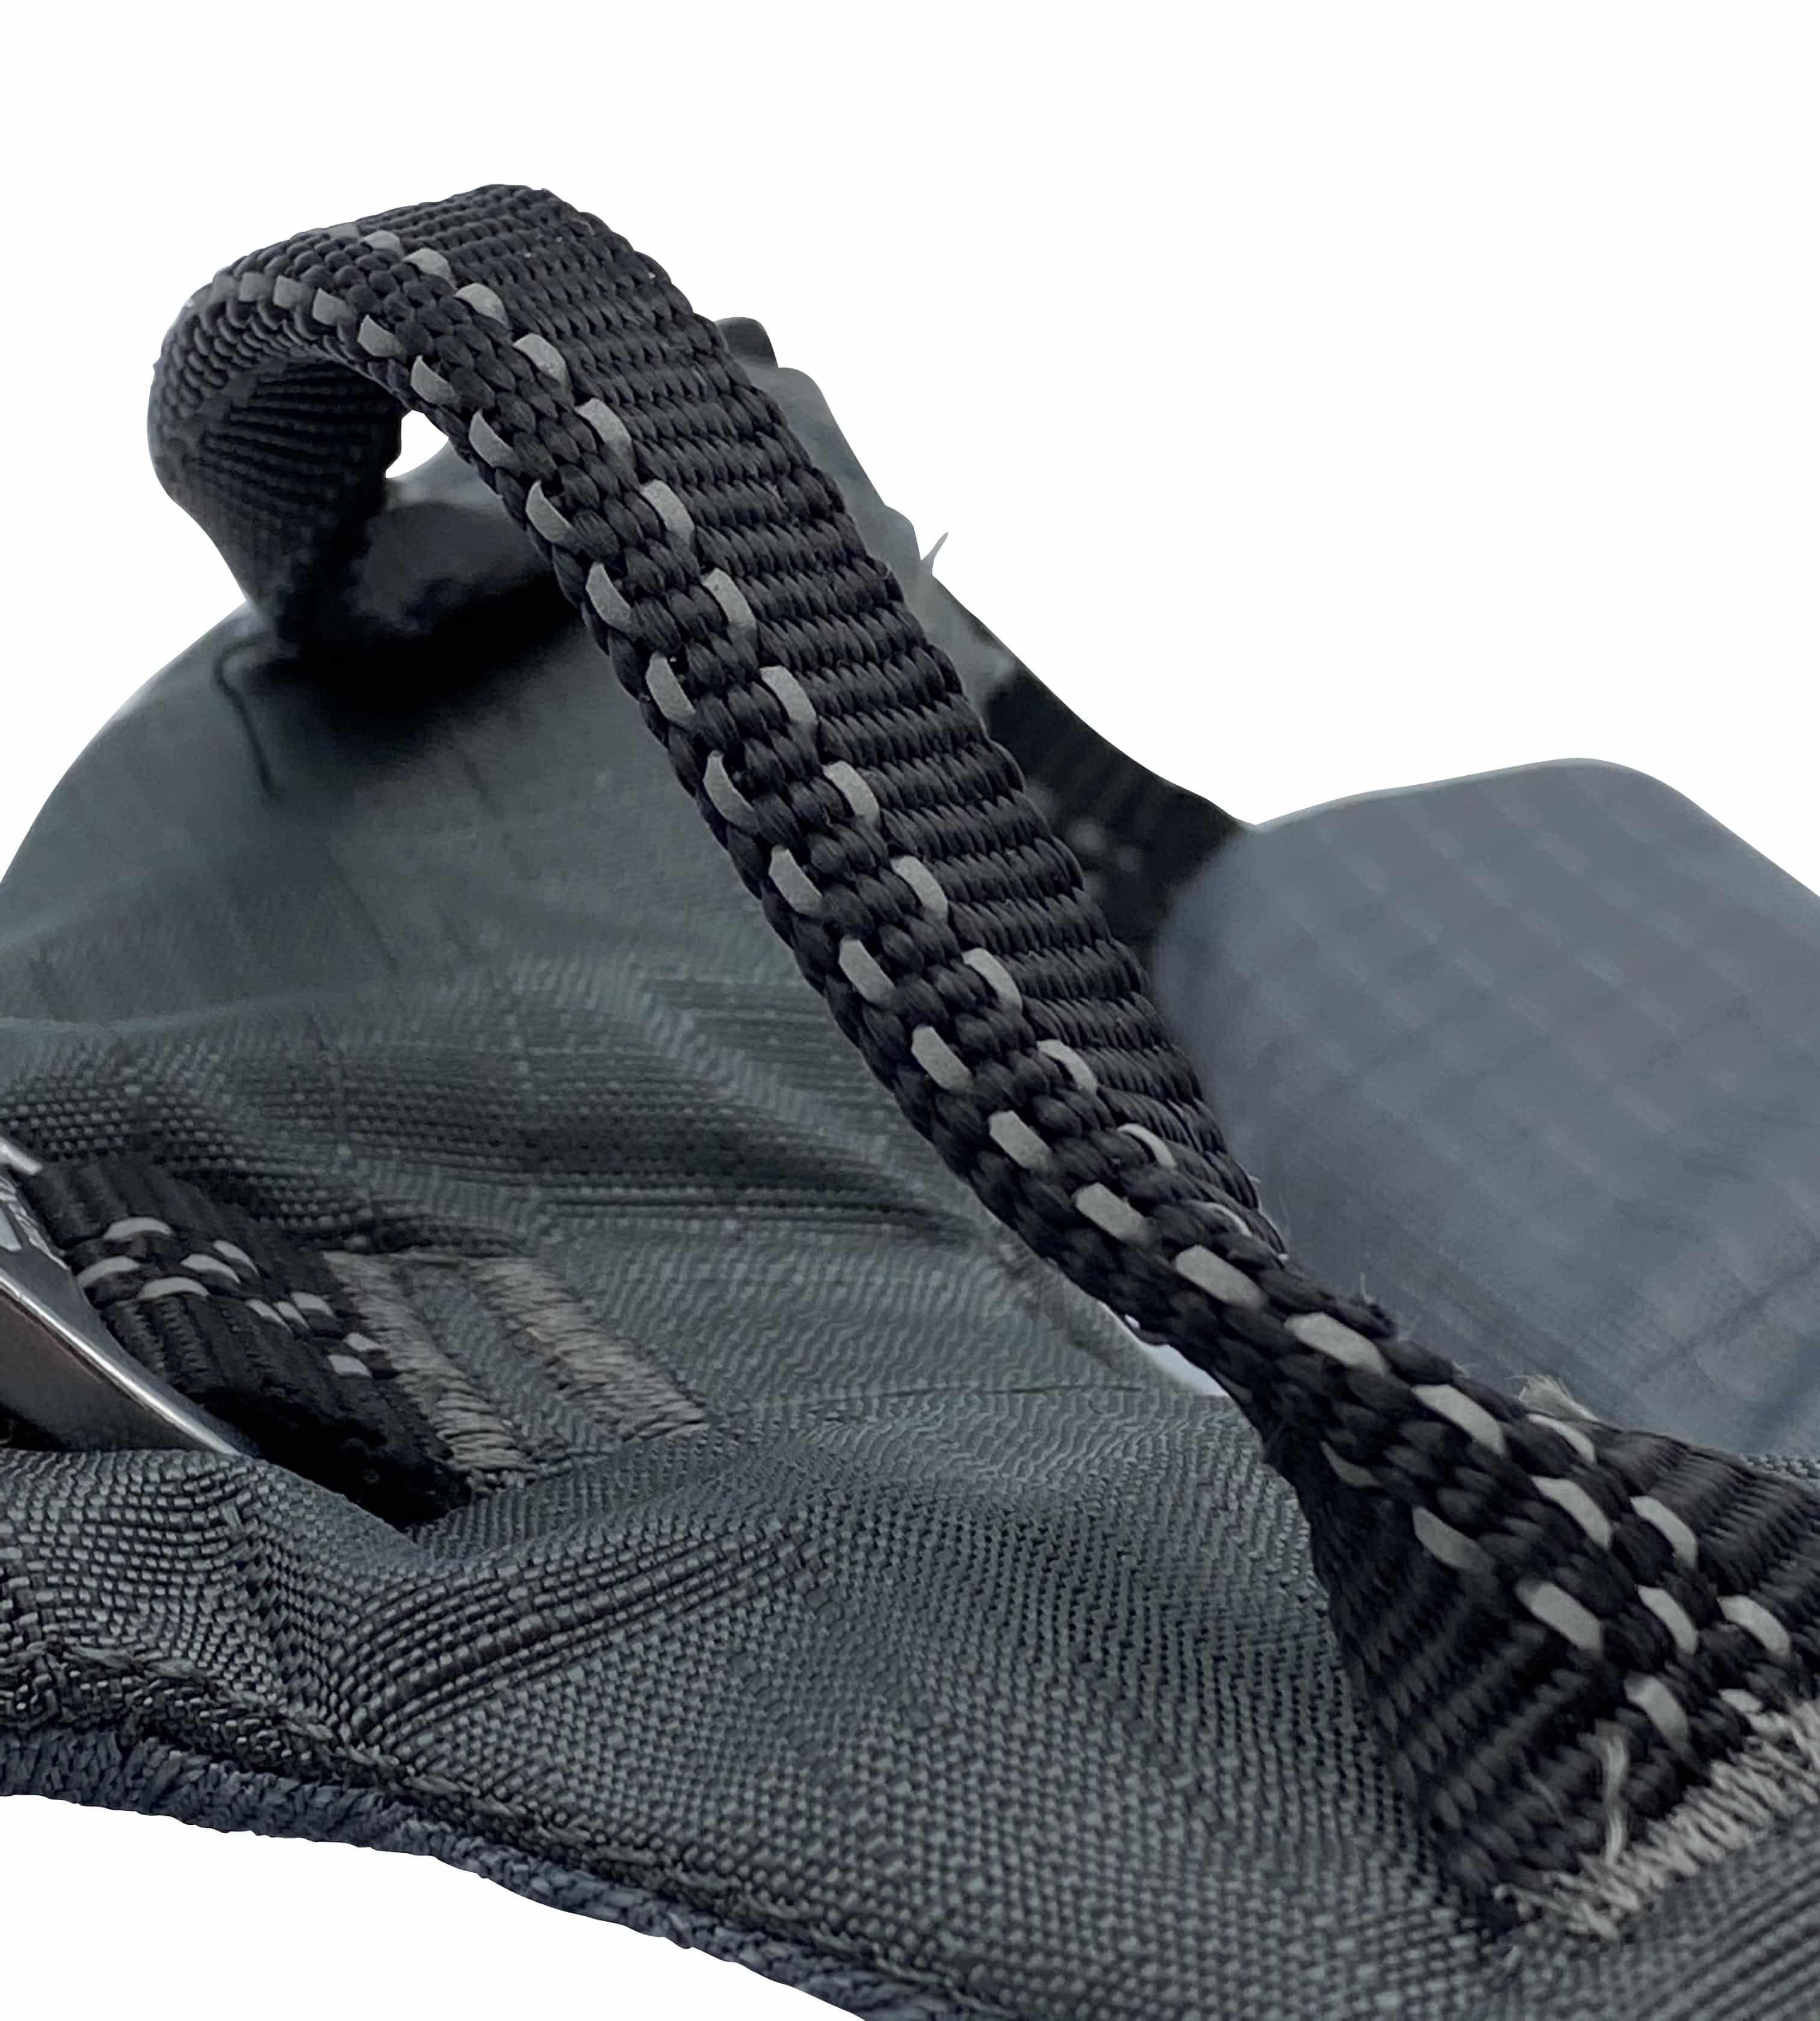 4animalz Anti-trektuig XS - No Pull Harnas - Borstvang 43-56 cm